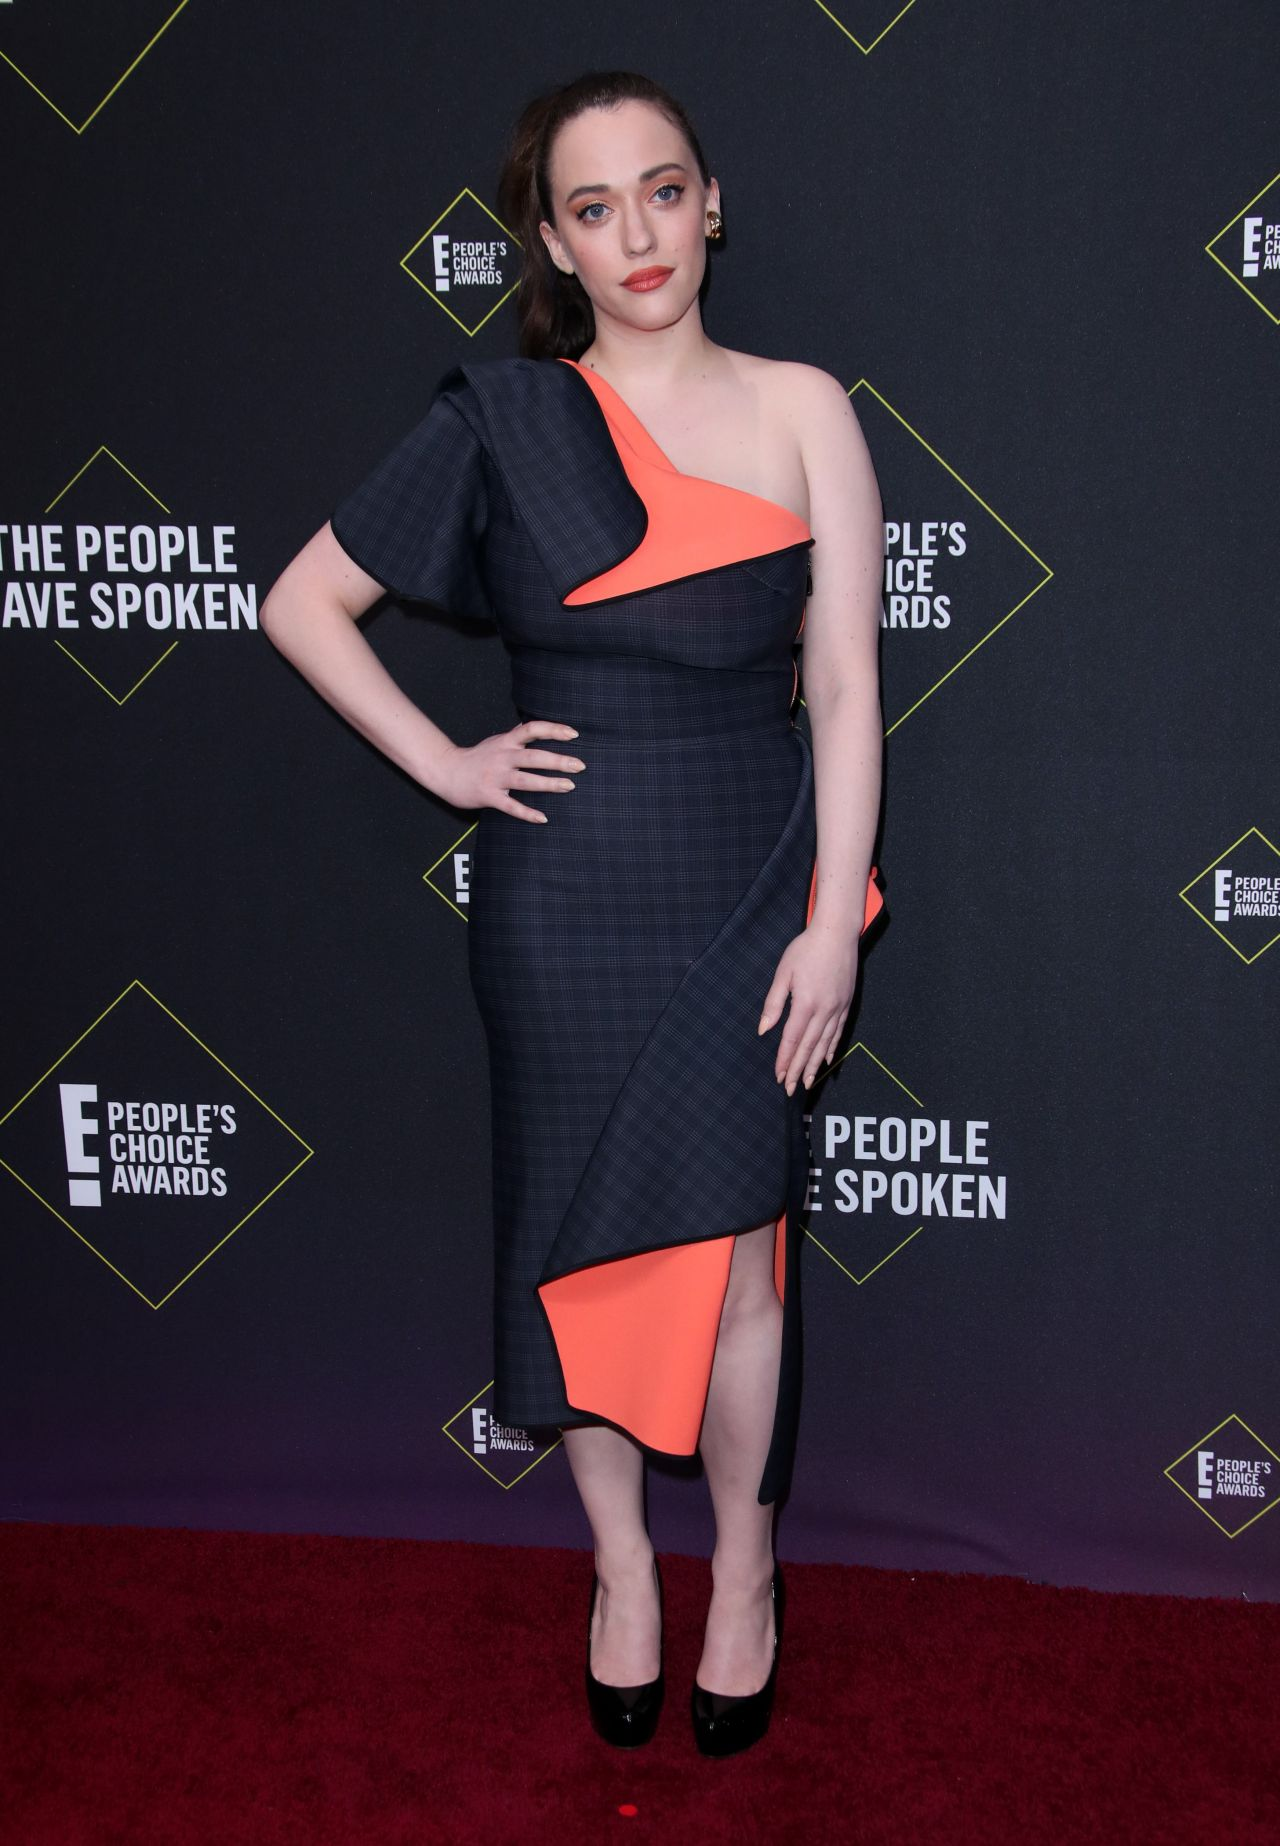 kat-dennings-in-maticevski-2019-peoples-choice-awards